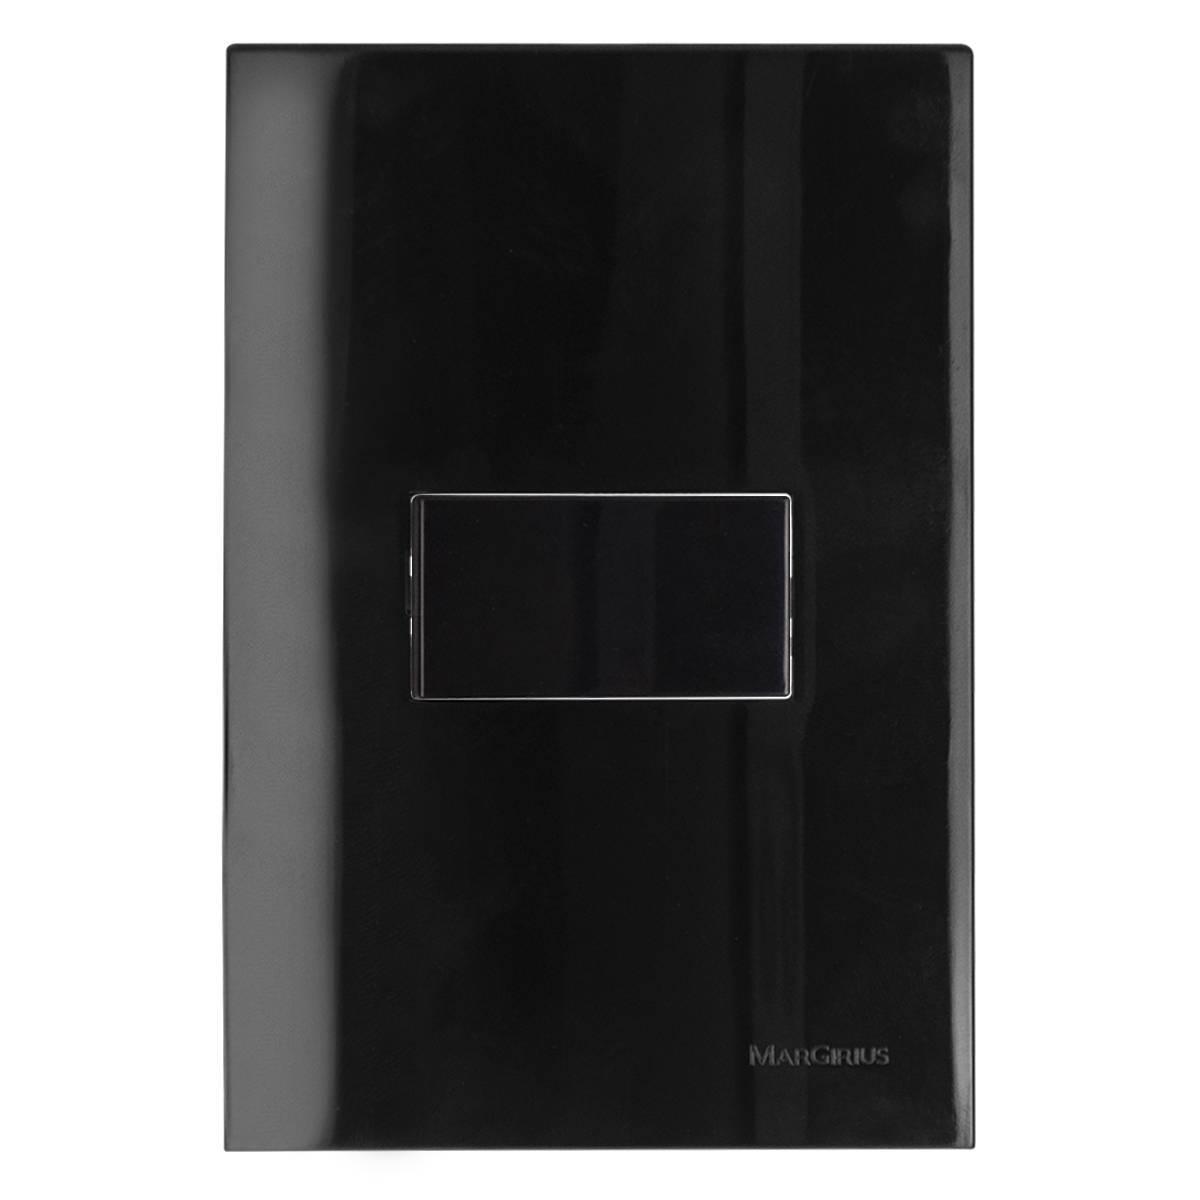 Conjunto Montado Sleek Ebony 4x2 1 Interruptor Paralelo Hori - LCGELETRO